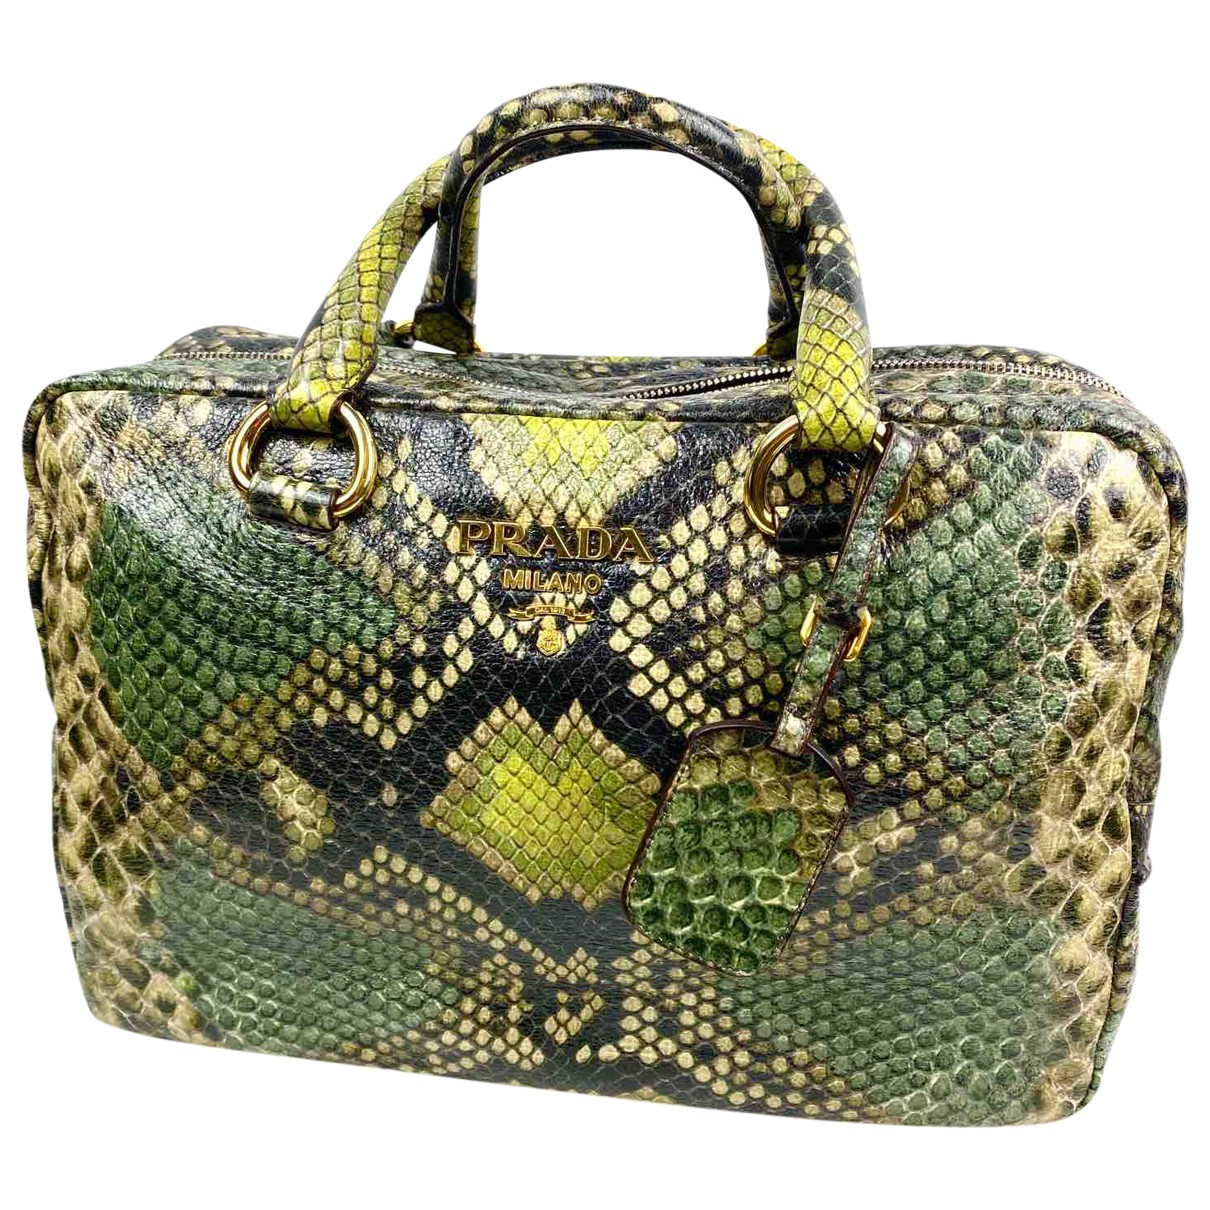 Prada \N Handtasche in  Gruen Leder